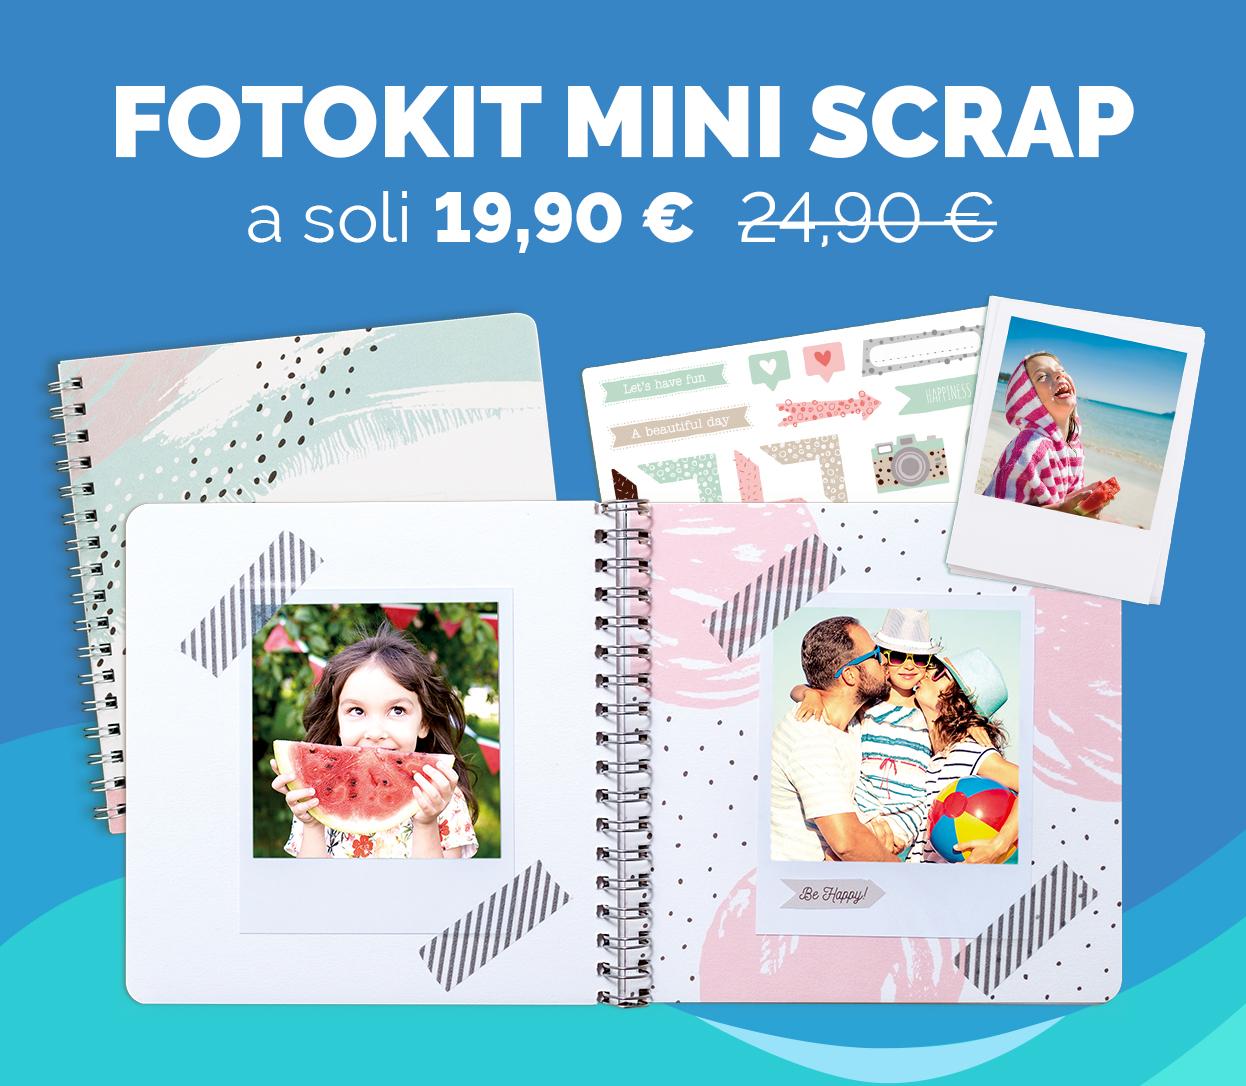 FotoKit Mini Scrap a soli 19,90€ anziché 24,90€